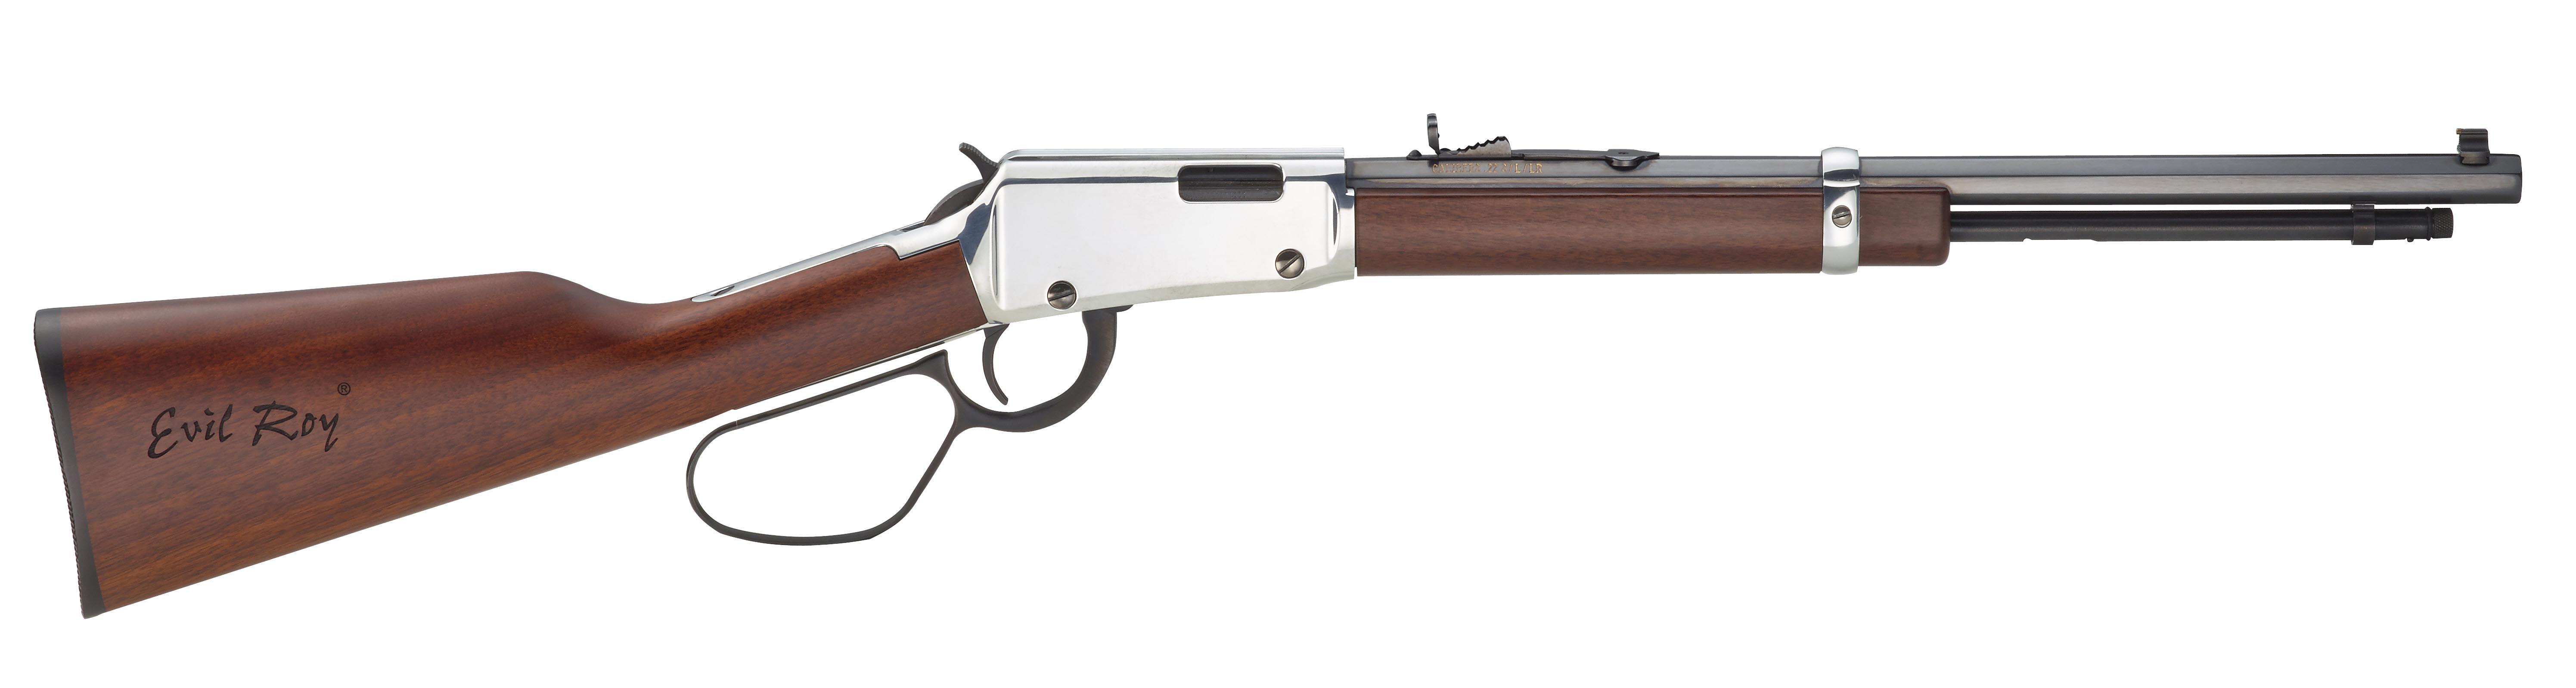 Henry EVIL ROY Frontier Carbine  ( H001TER )